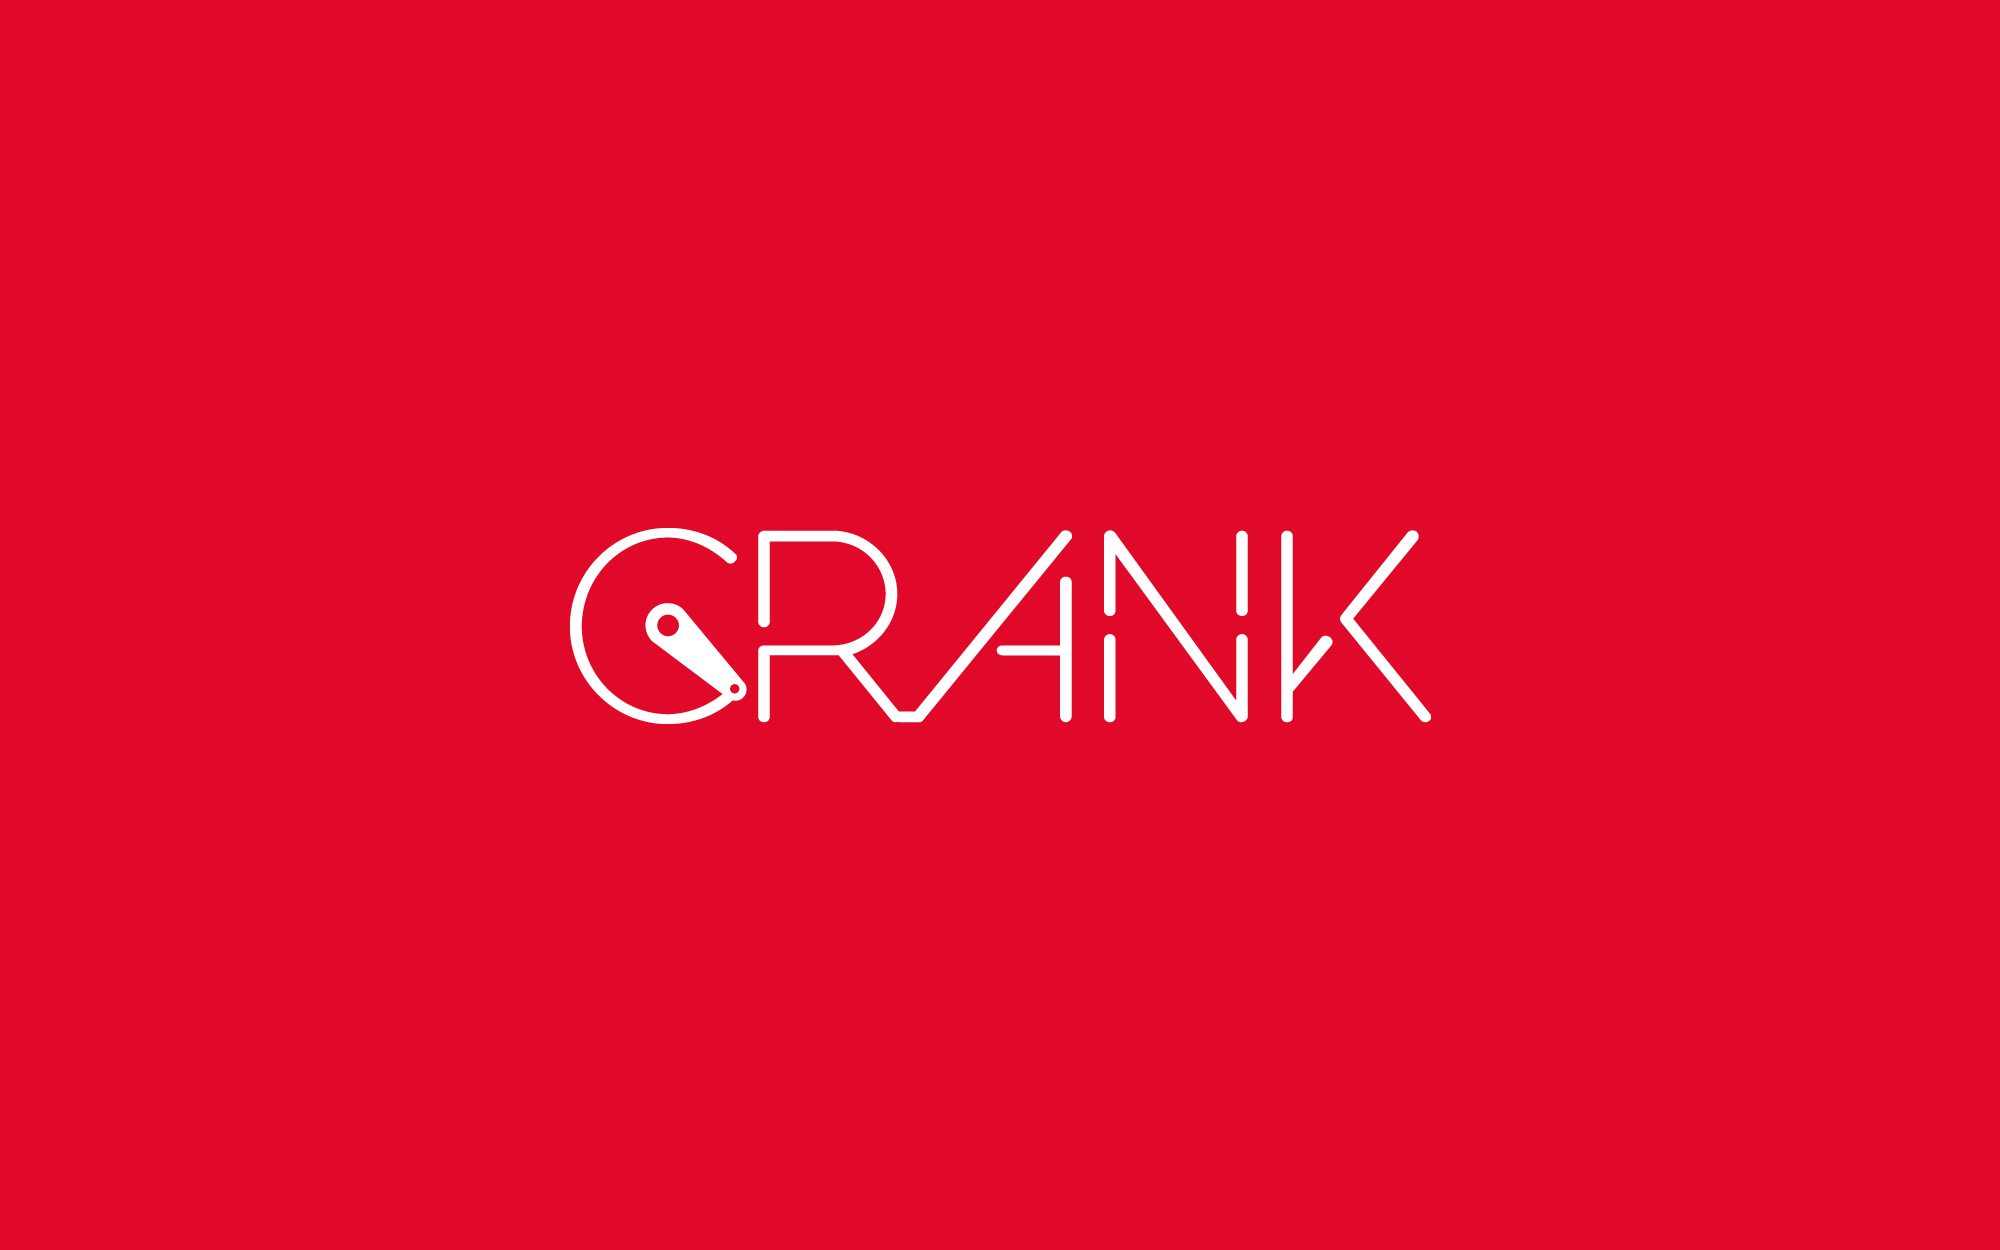 crank_branding_matthew_pomorski_kent_graphic_design_3